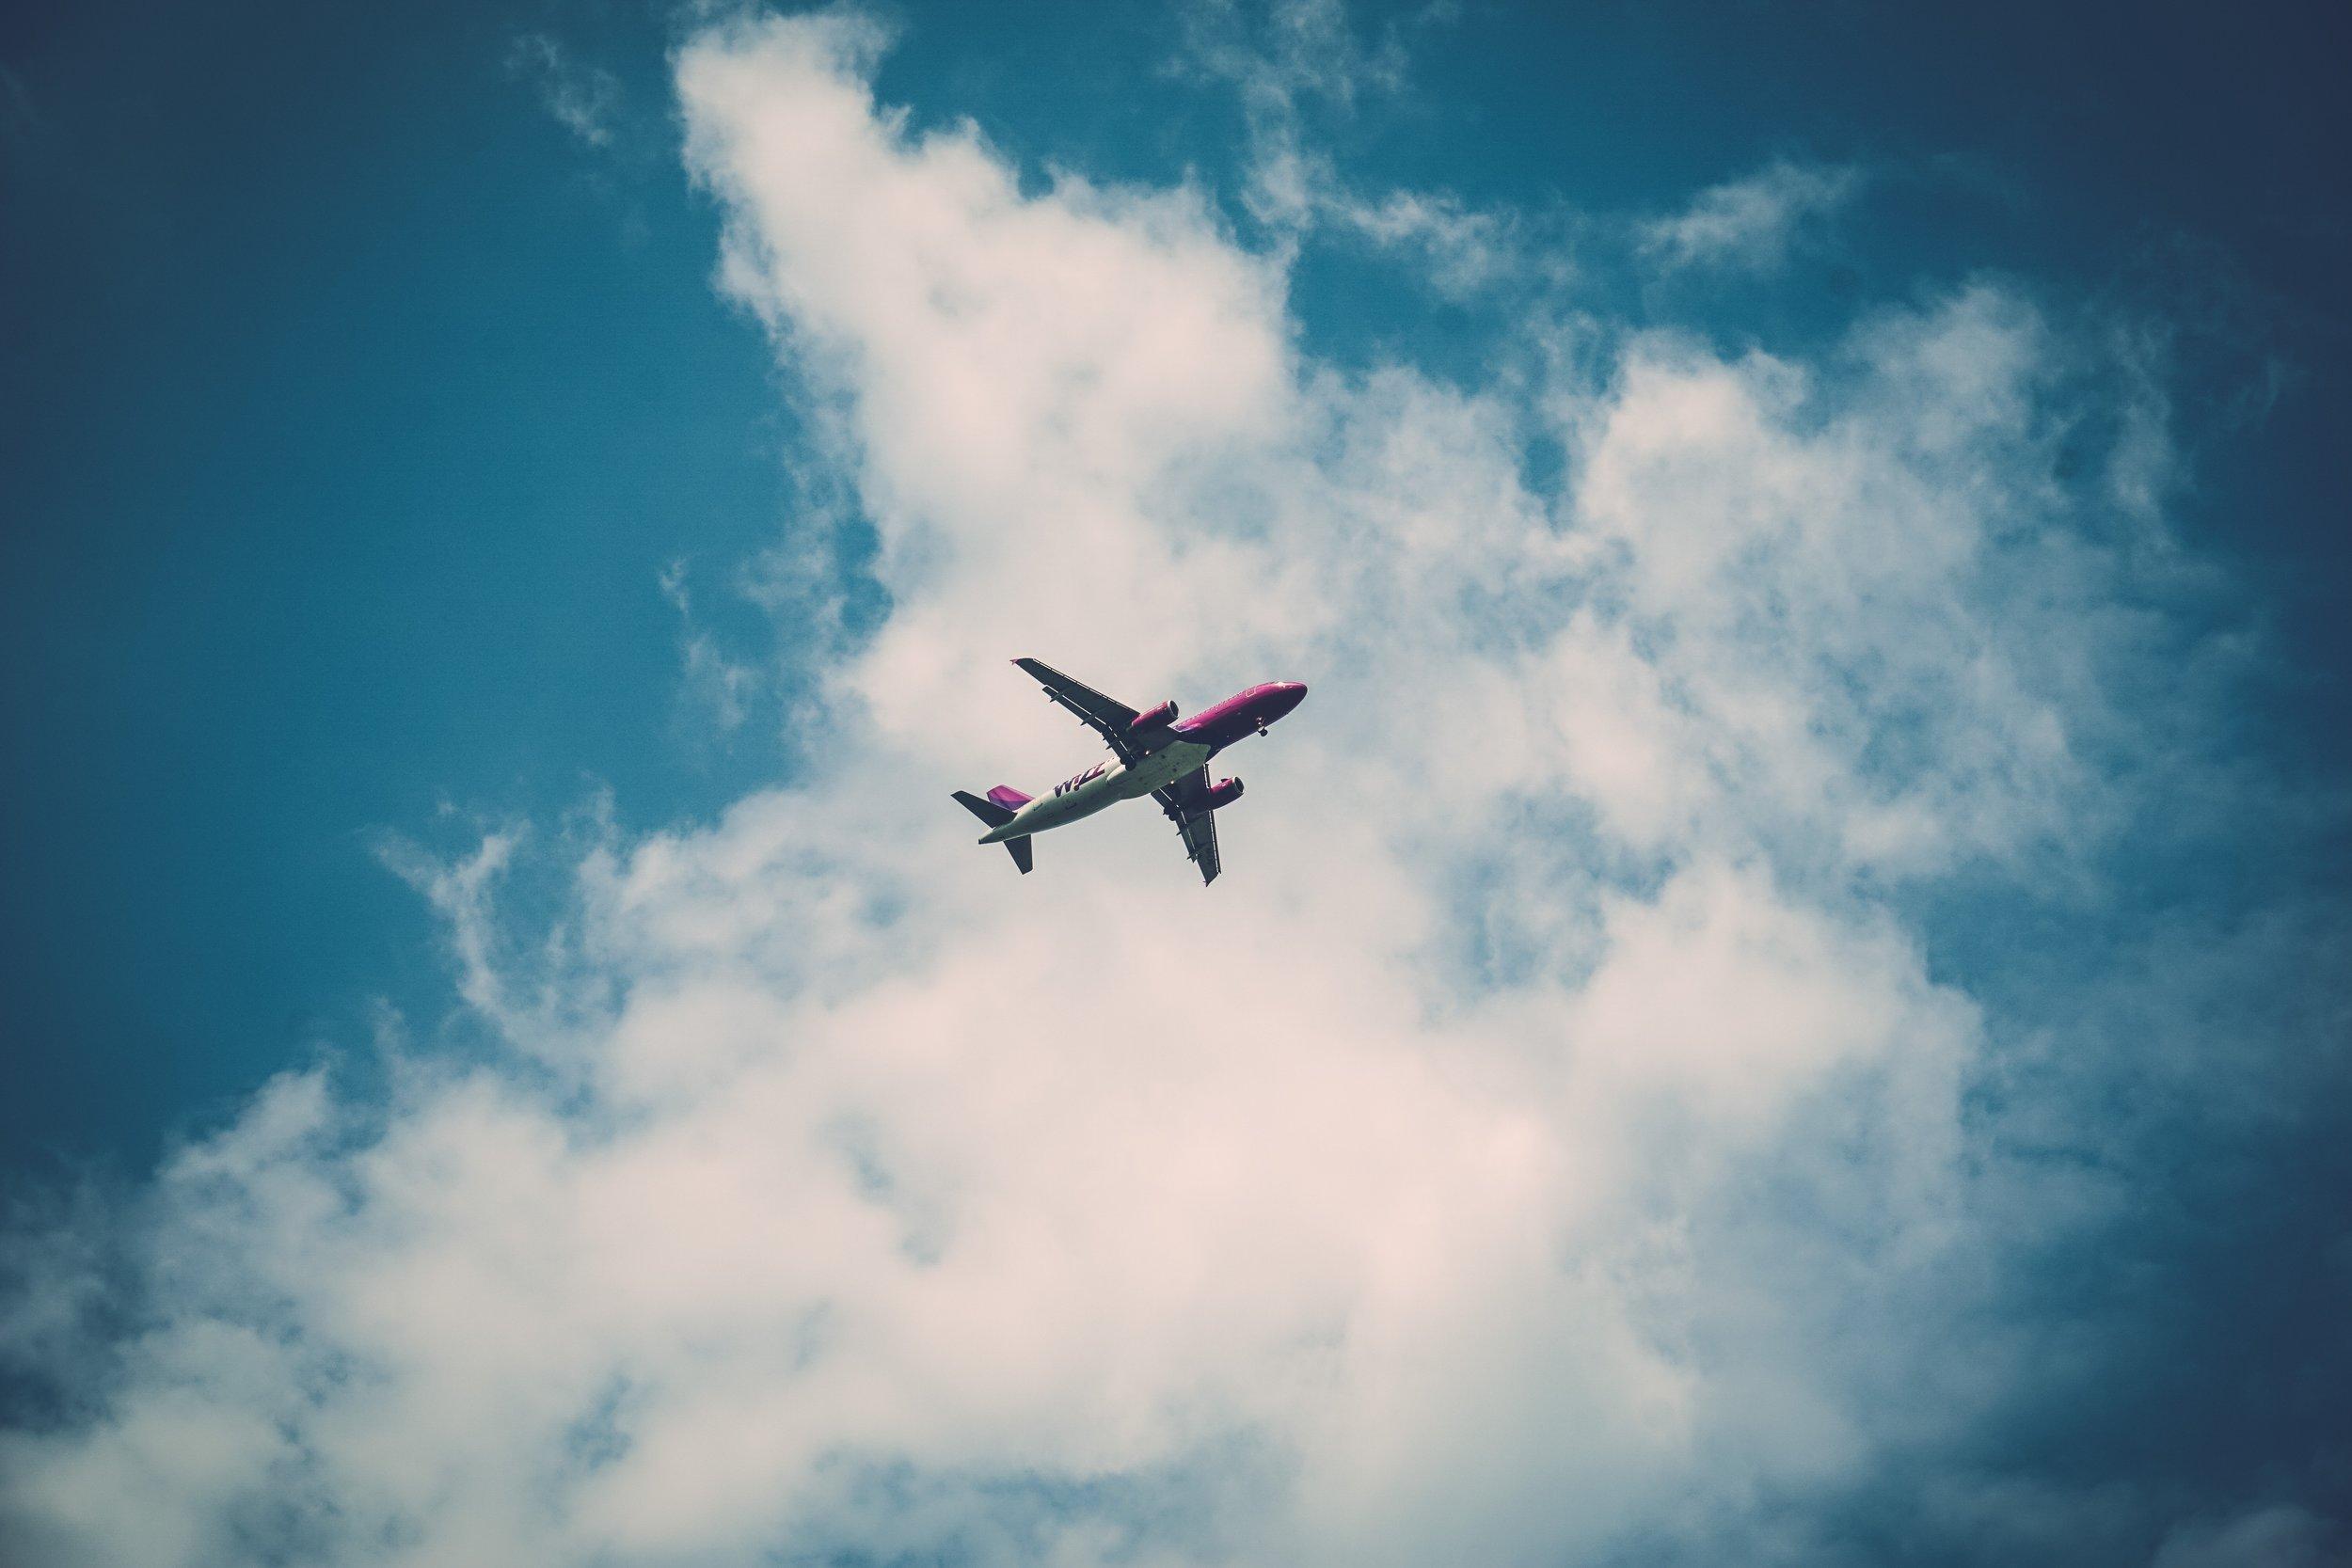 aircraft-airplane-aviation-8394.jpg